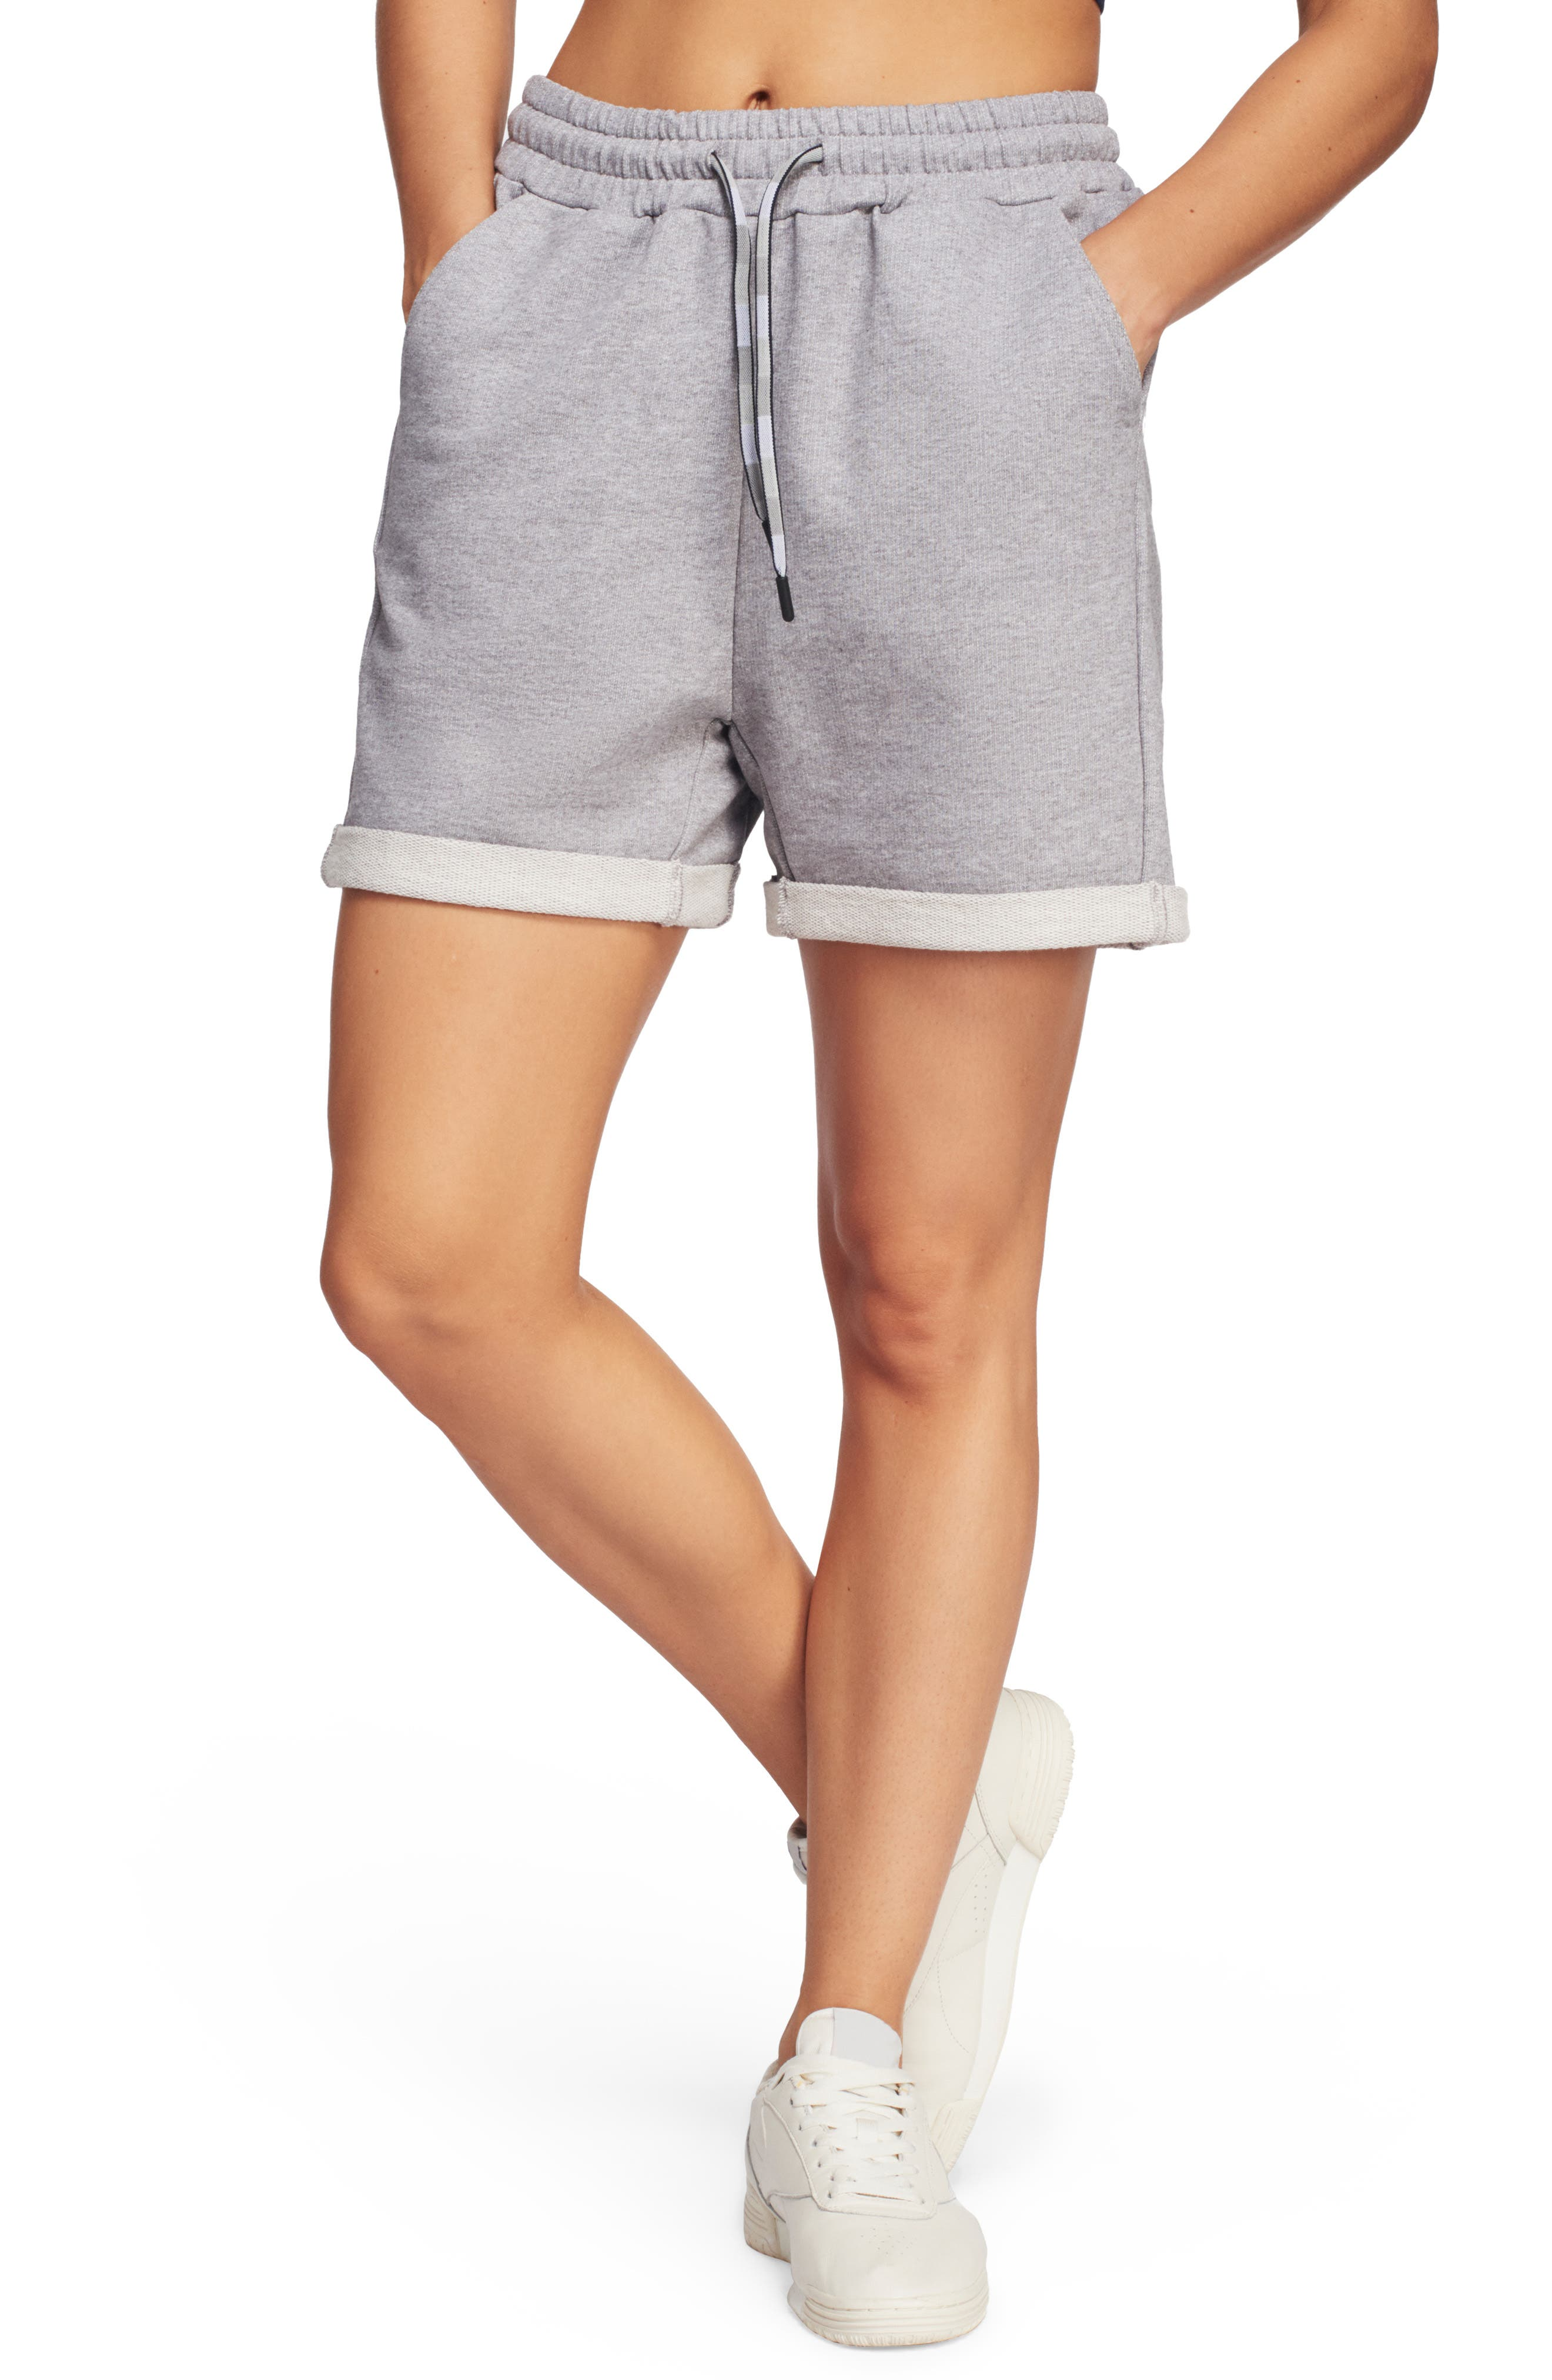 Lndr Brisk Track Shorts, Grey